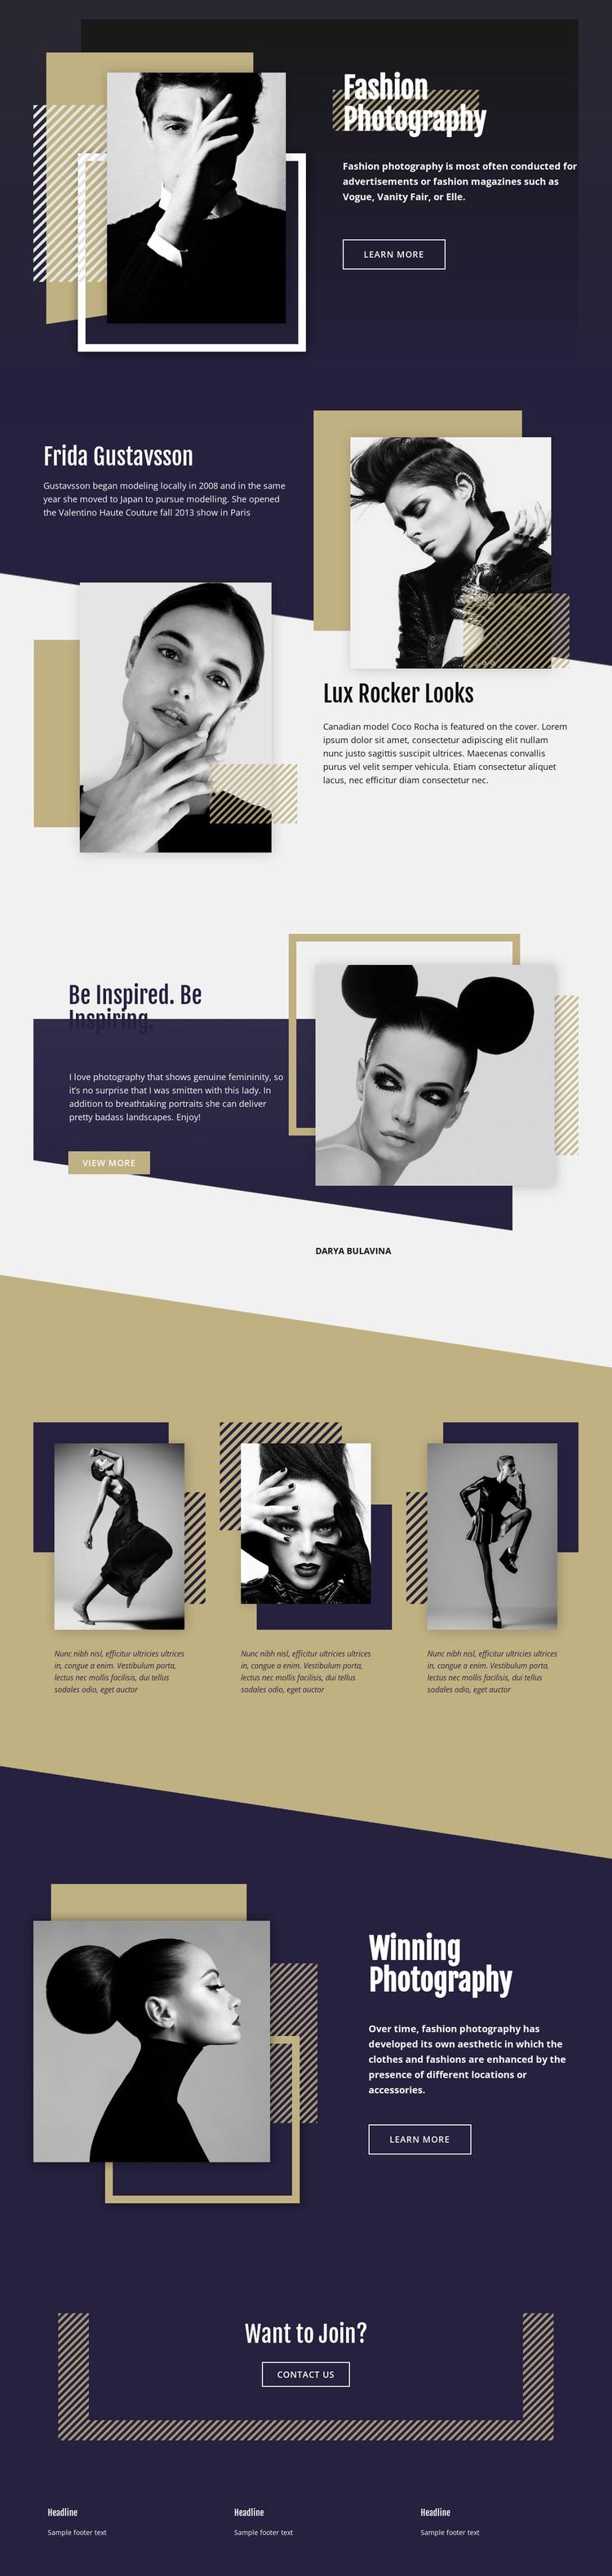 Fashion Photography Website Design